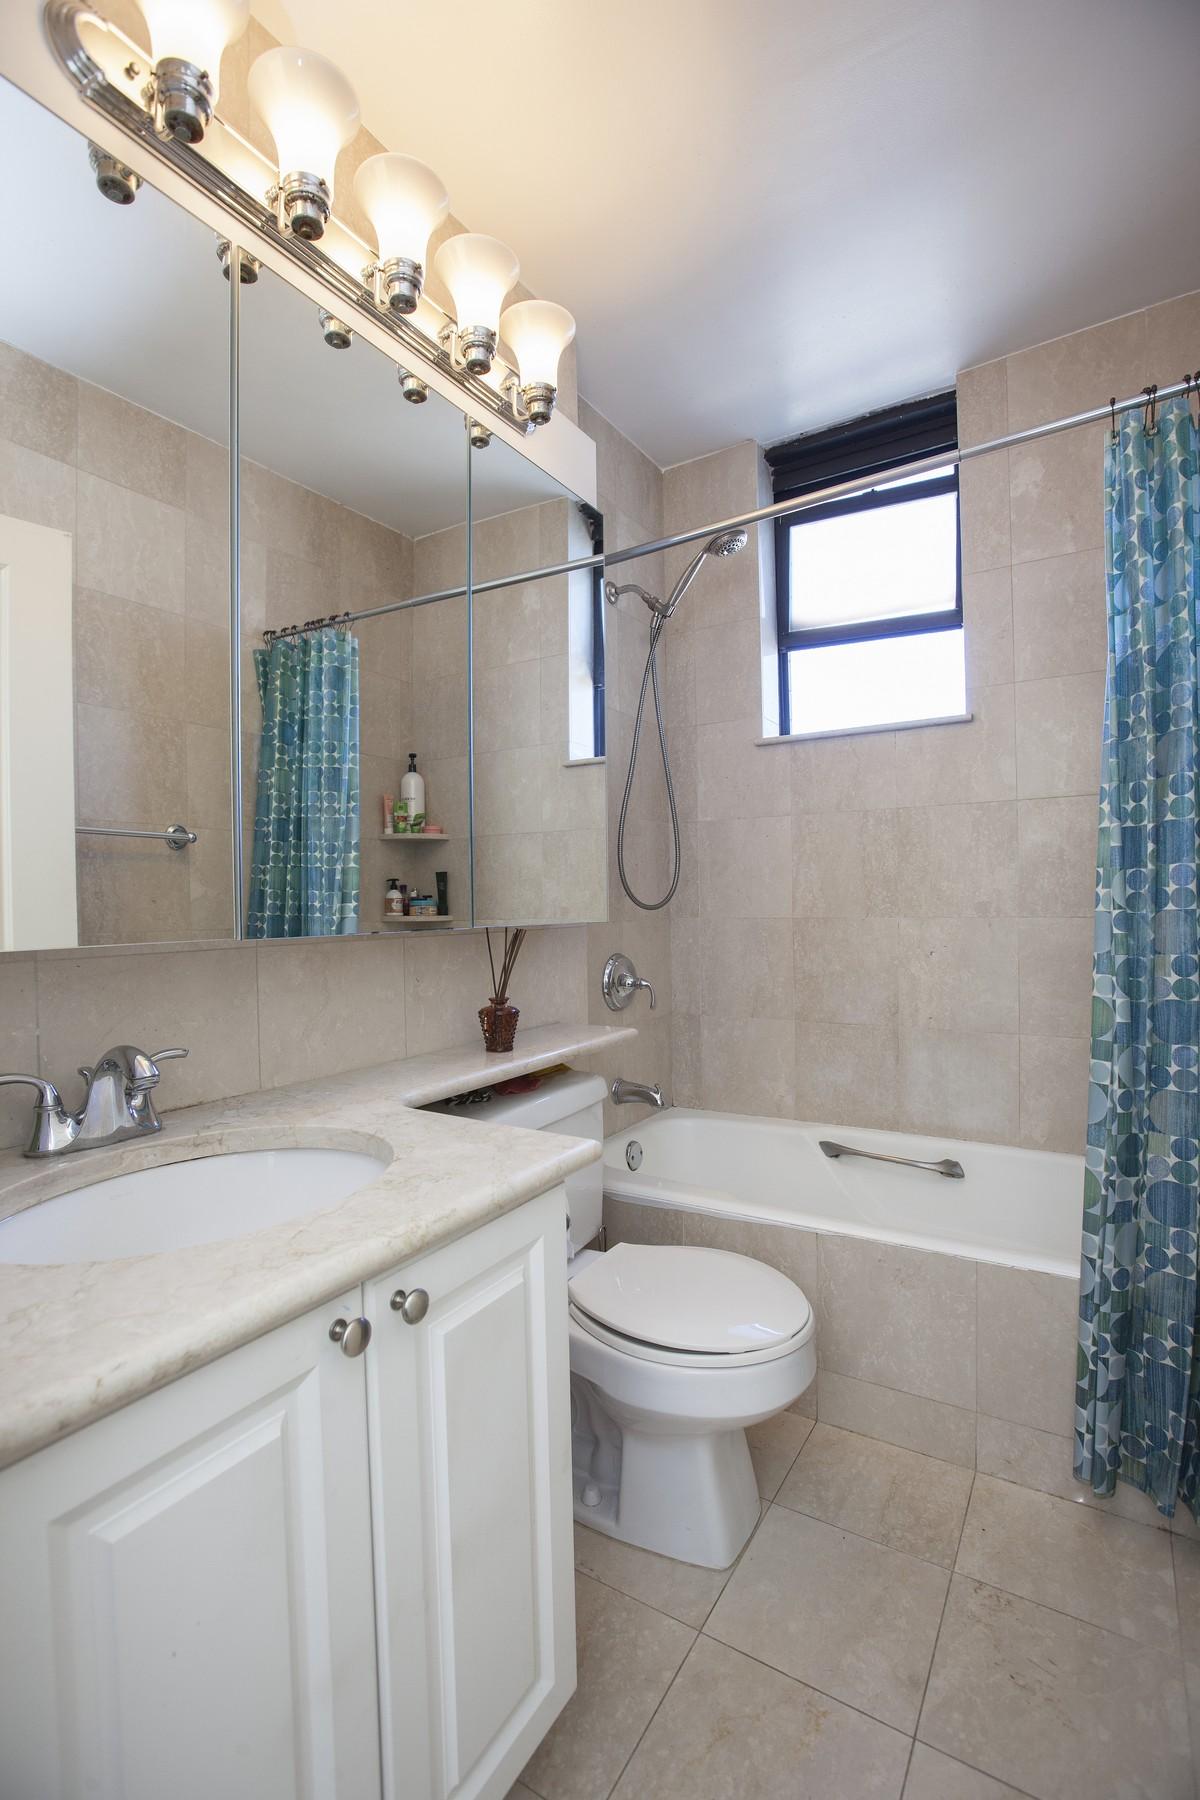 East_95th_Street_205_33J_Bathroom_.jpg